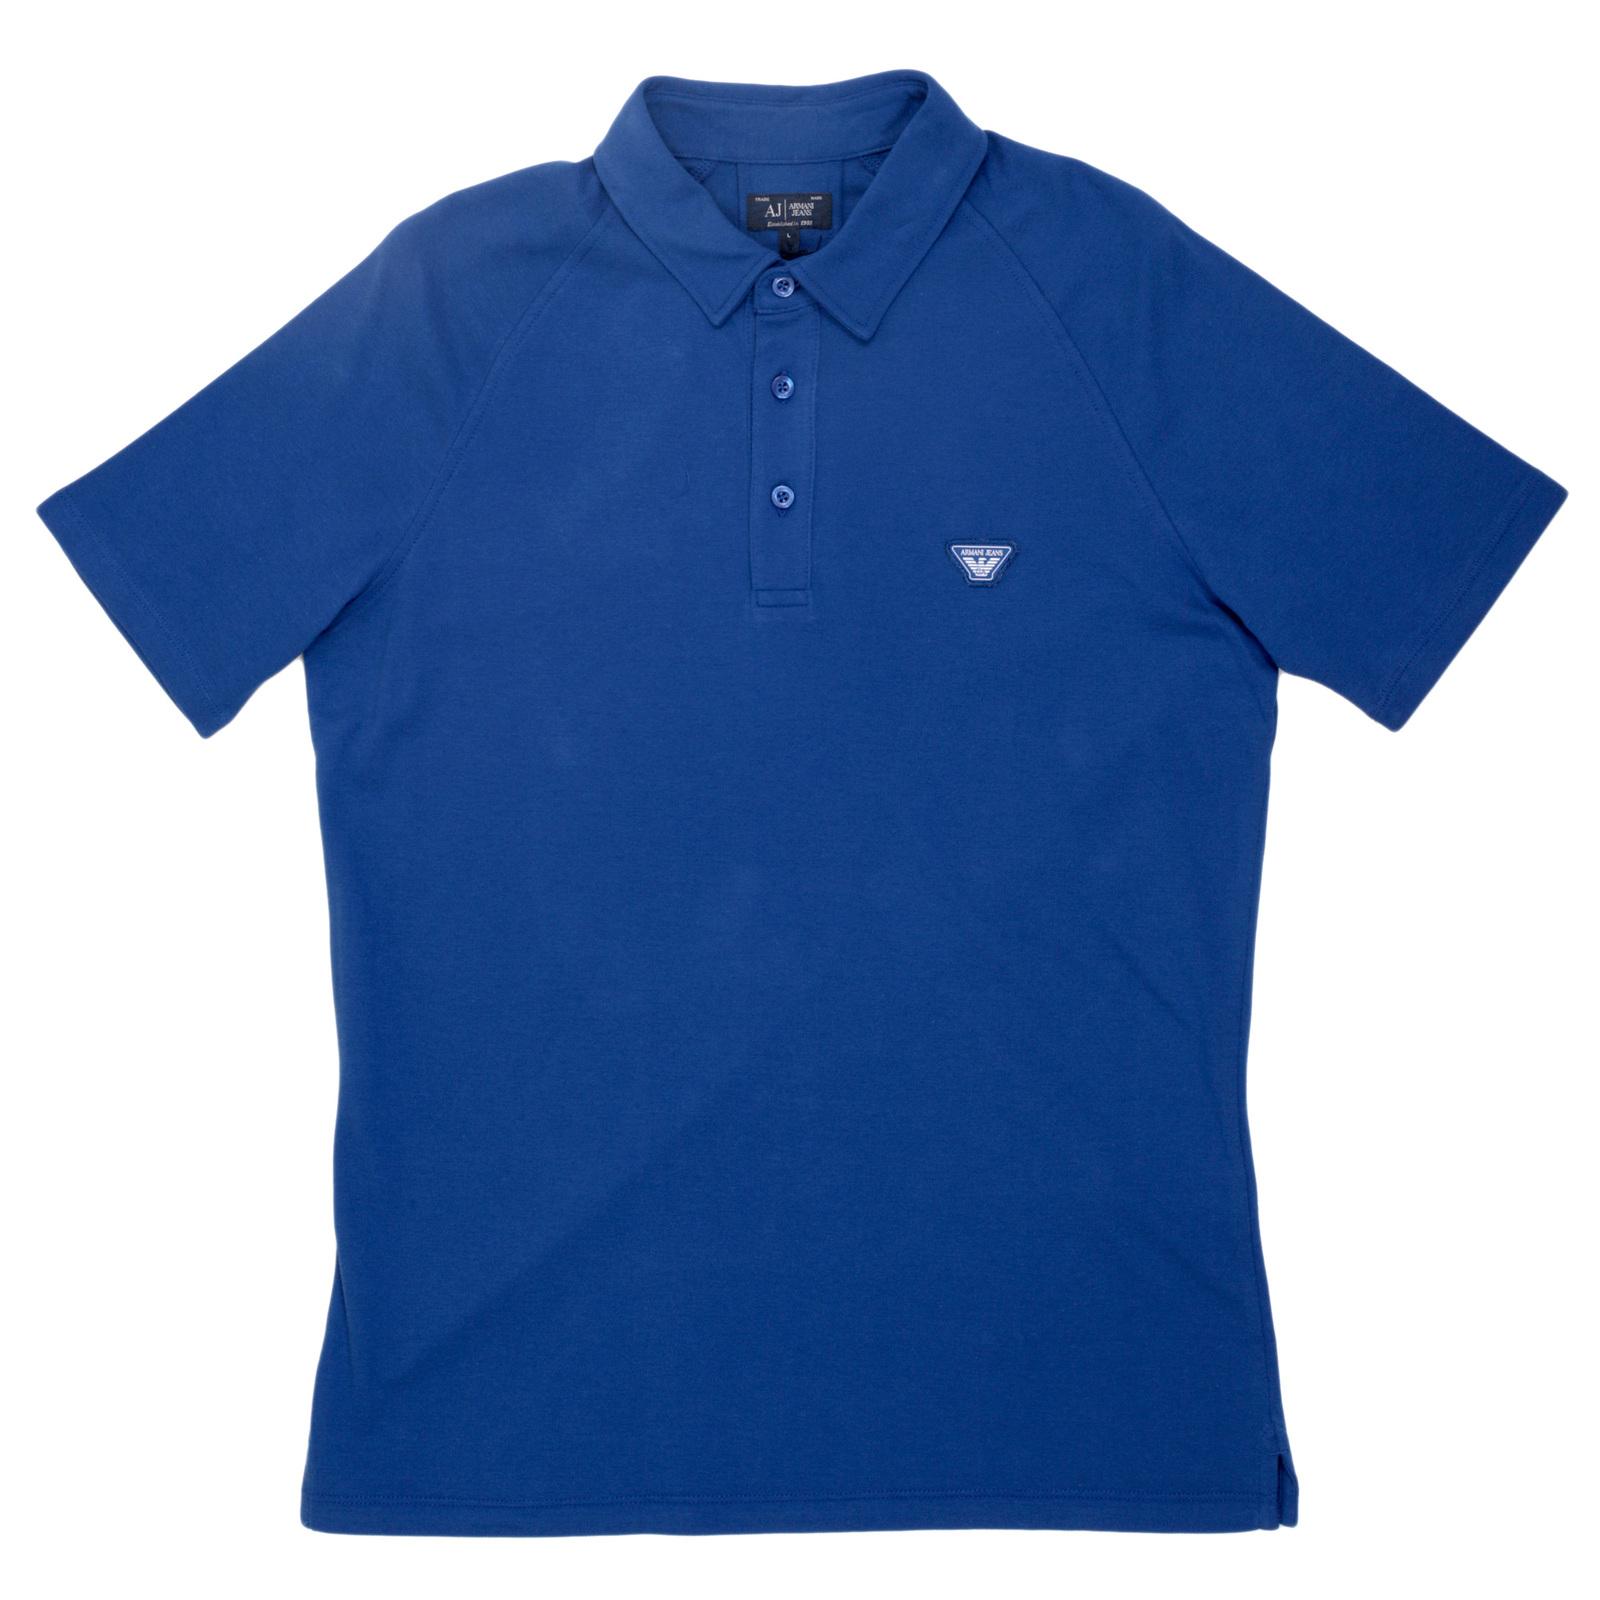 Polo Jeans Shirt Armani Armani Blue Blue Shirt Jeans Polo Armani 0vN8mnw